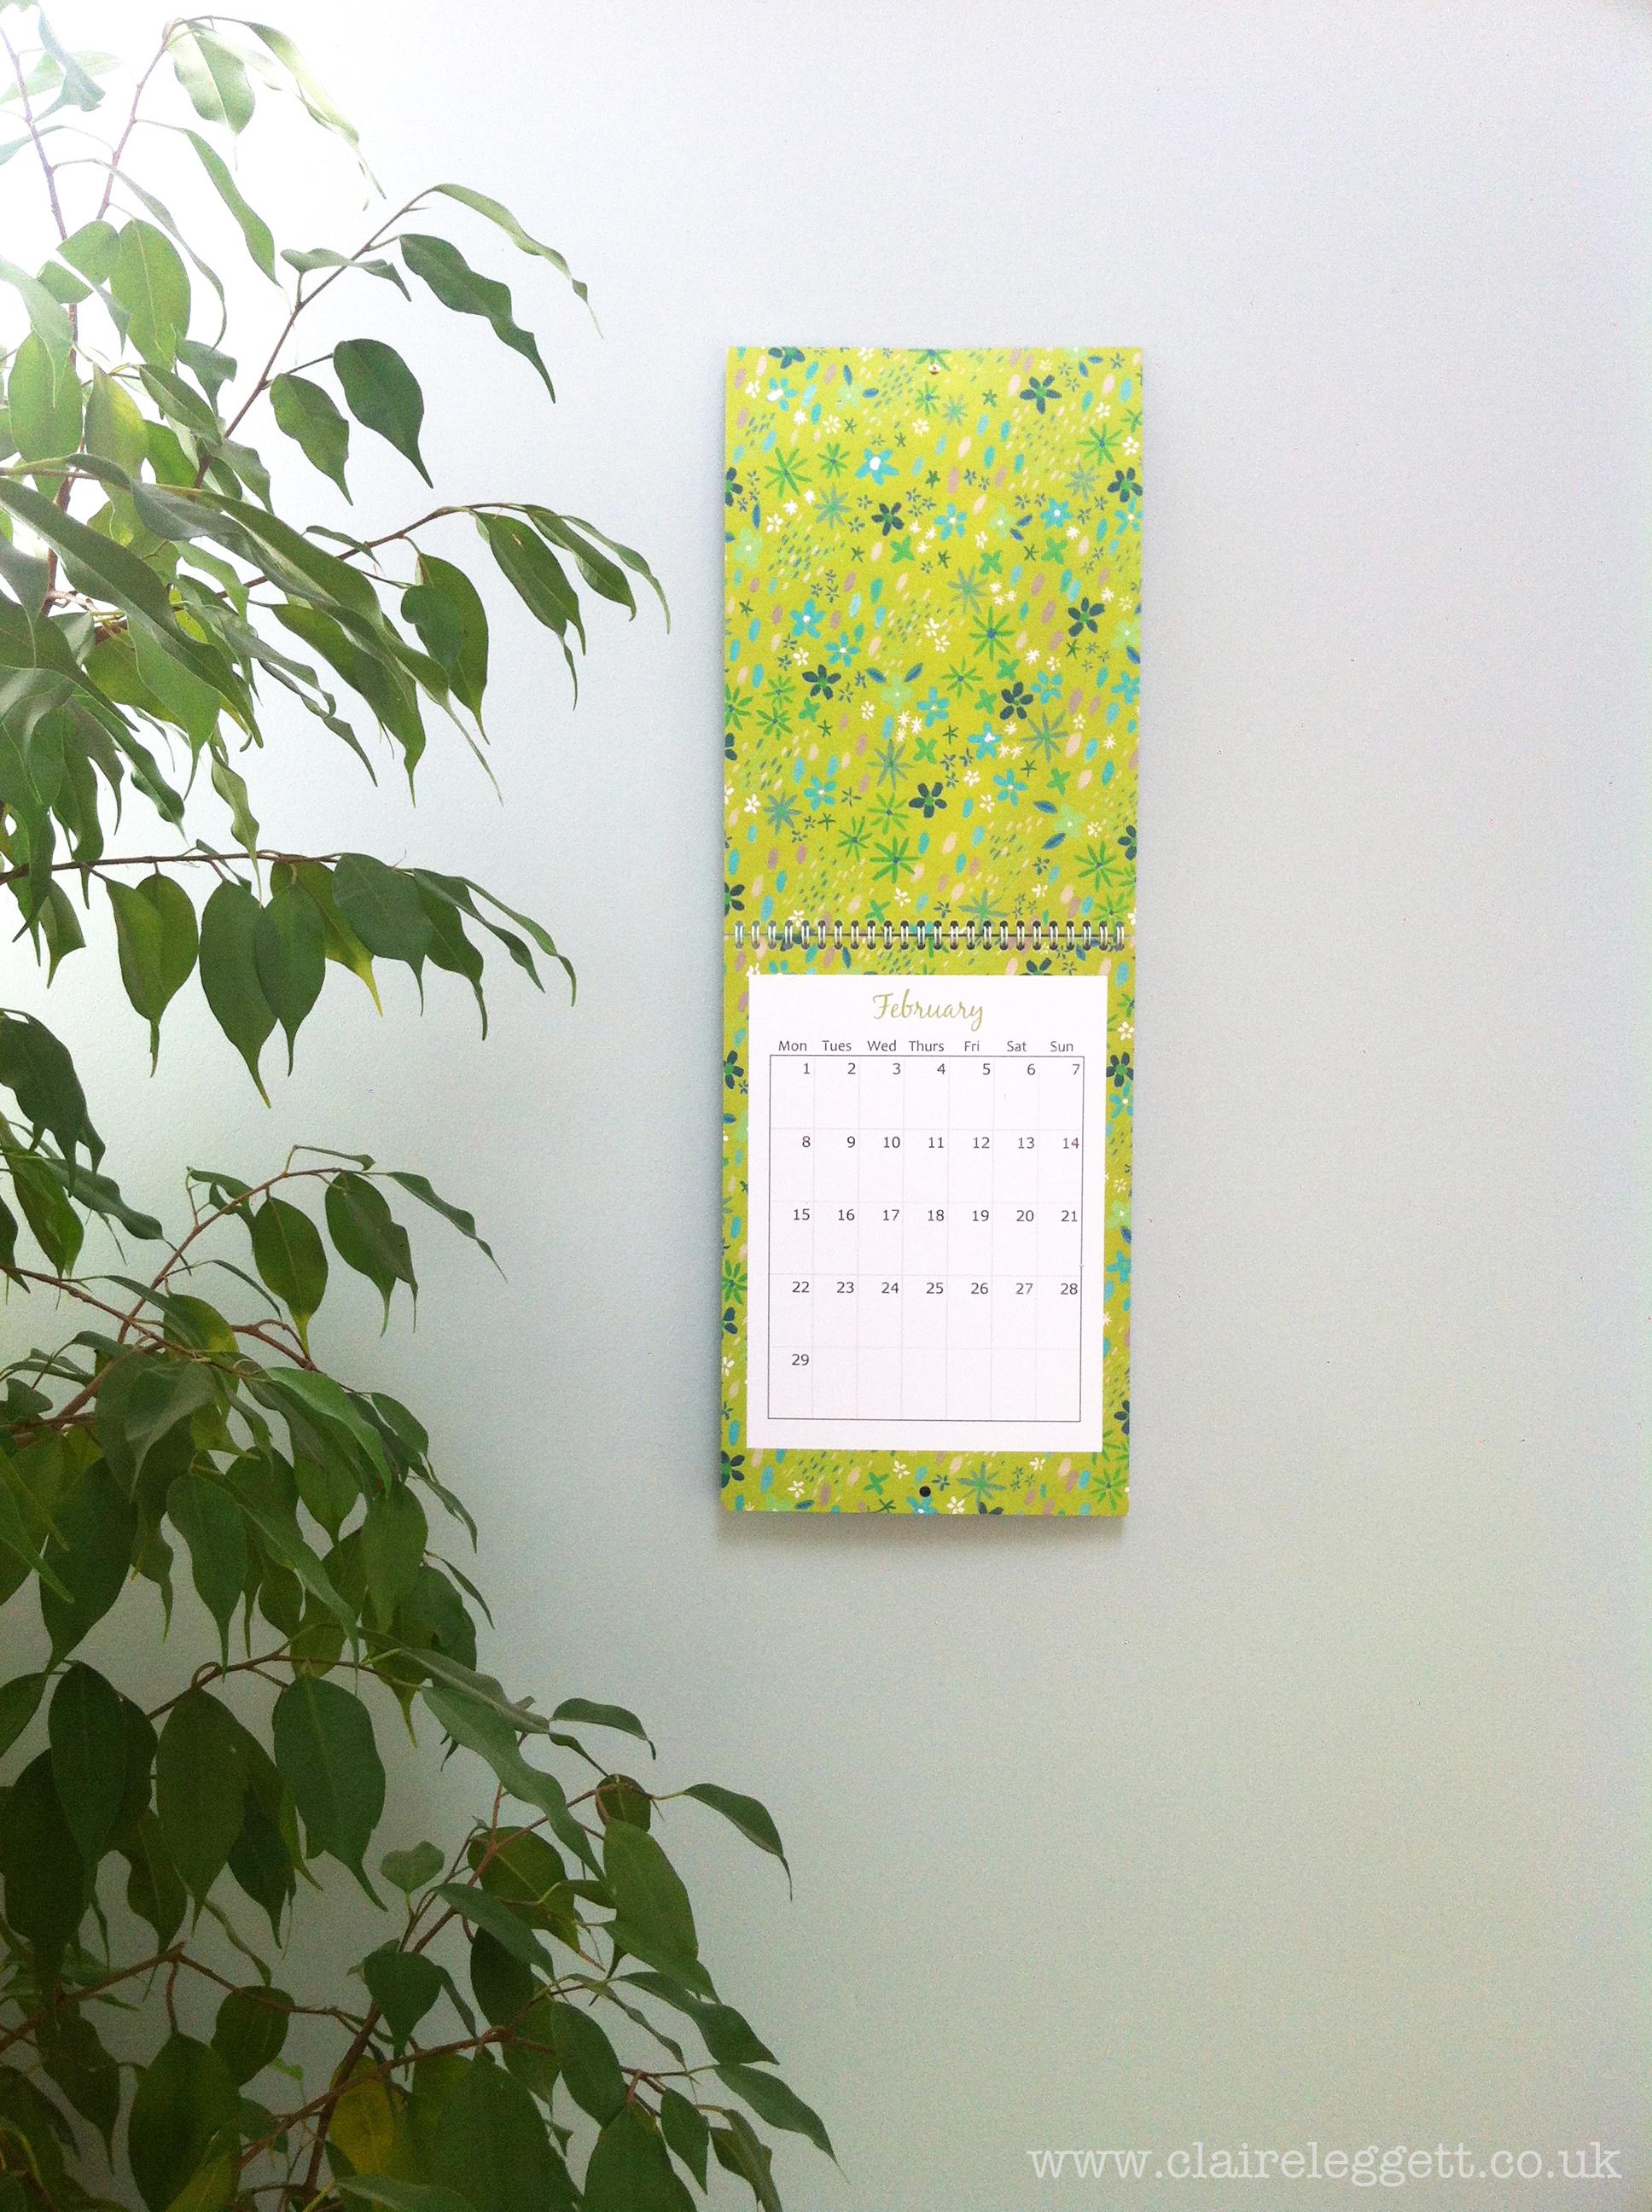 Claire_leggett_surface_pattern_design_calendar_FEB_2016 copy